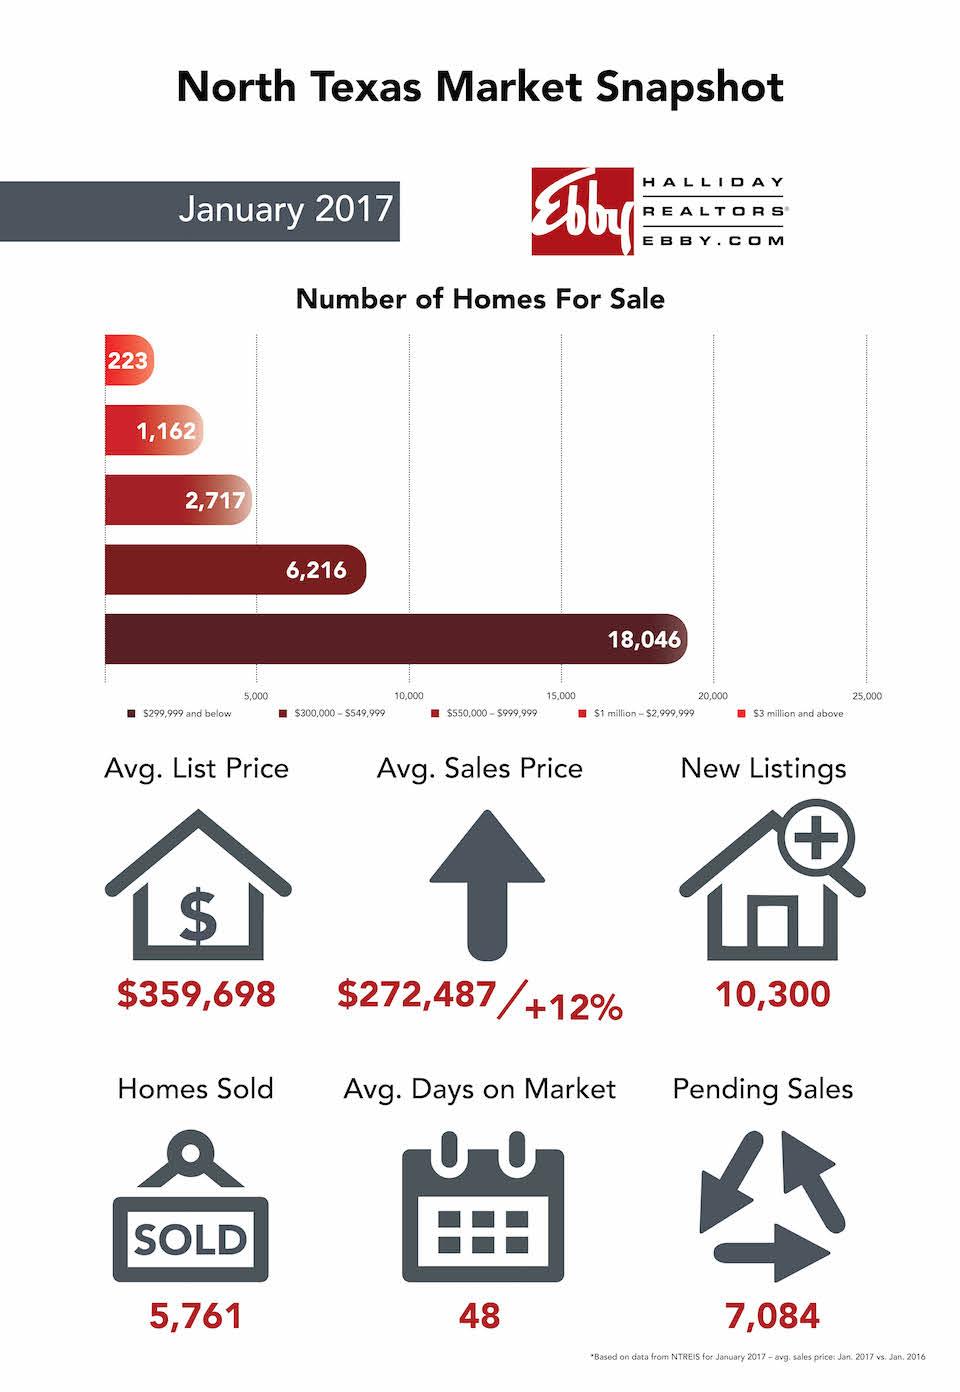 North Texas Housing Market - Lisa Birdsong